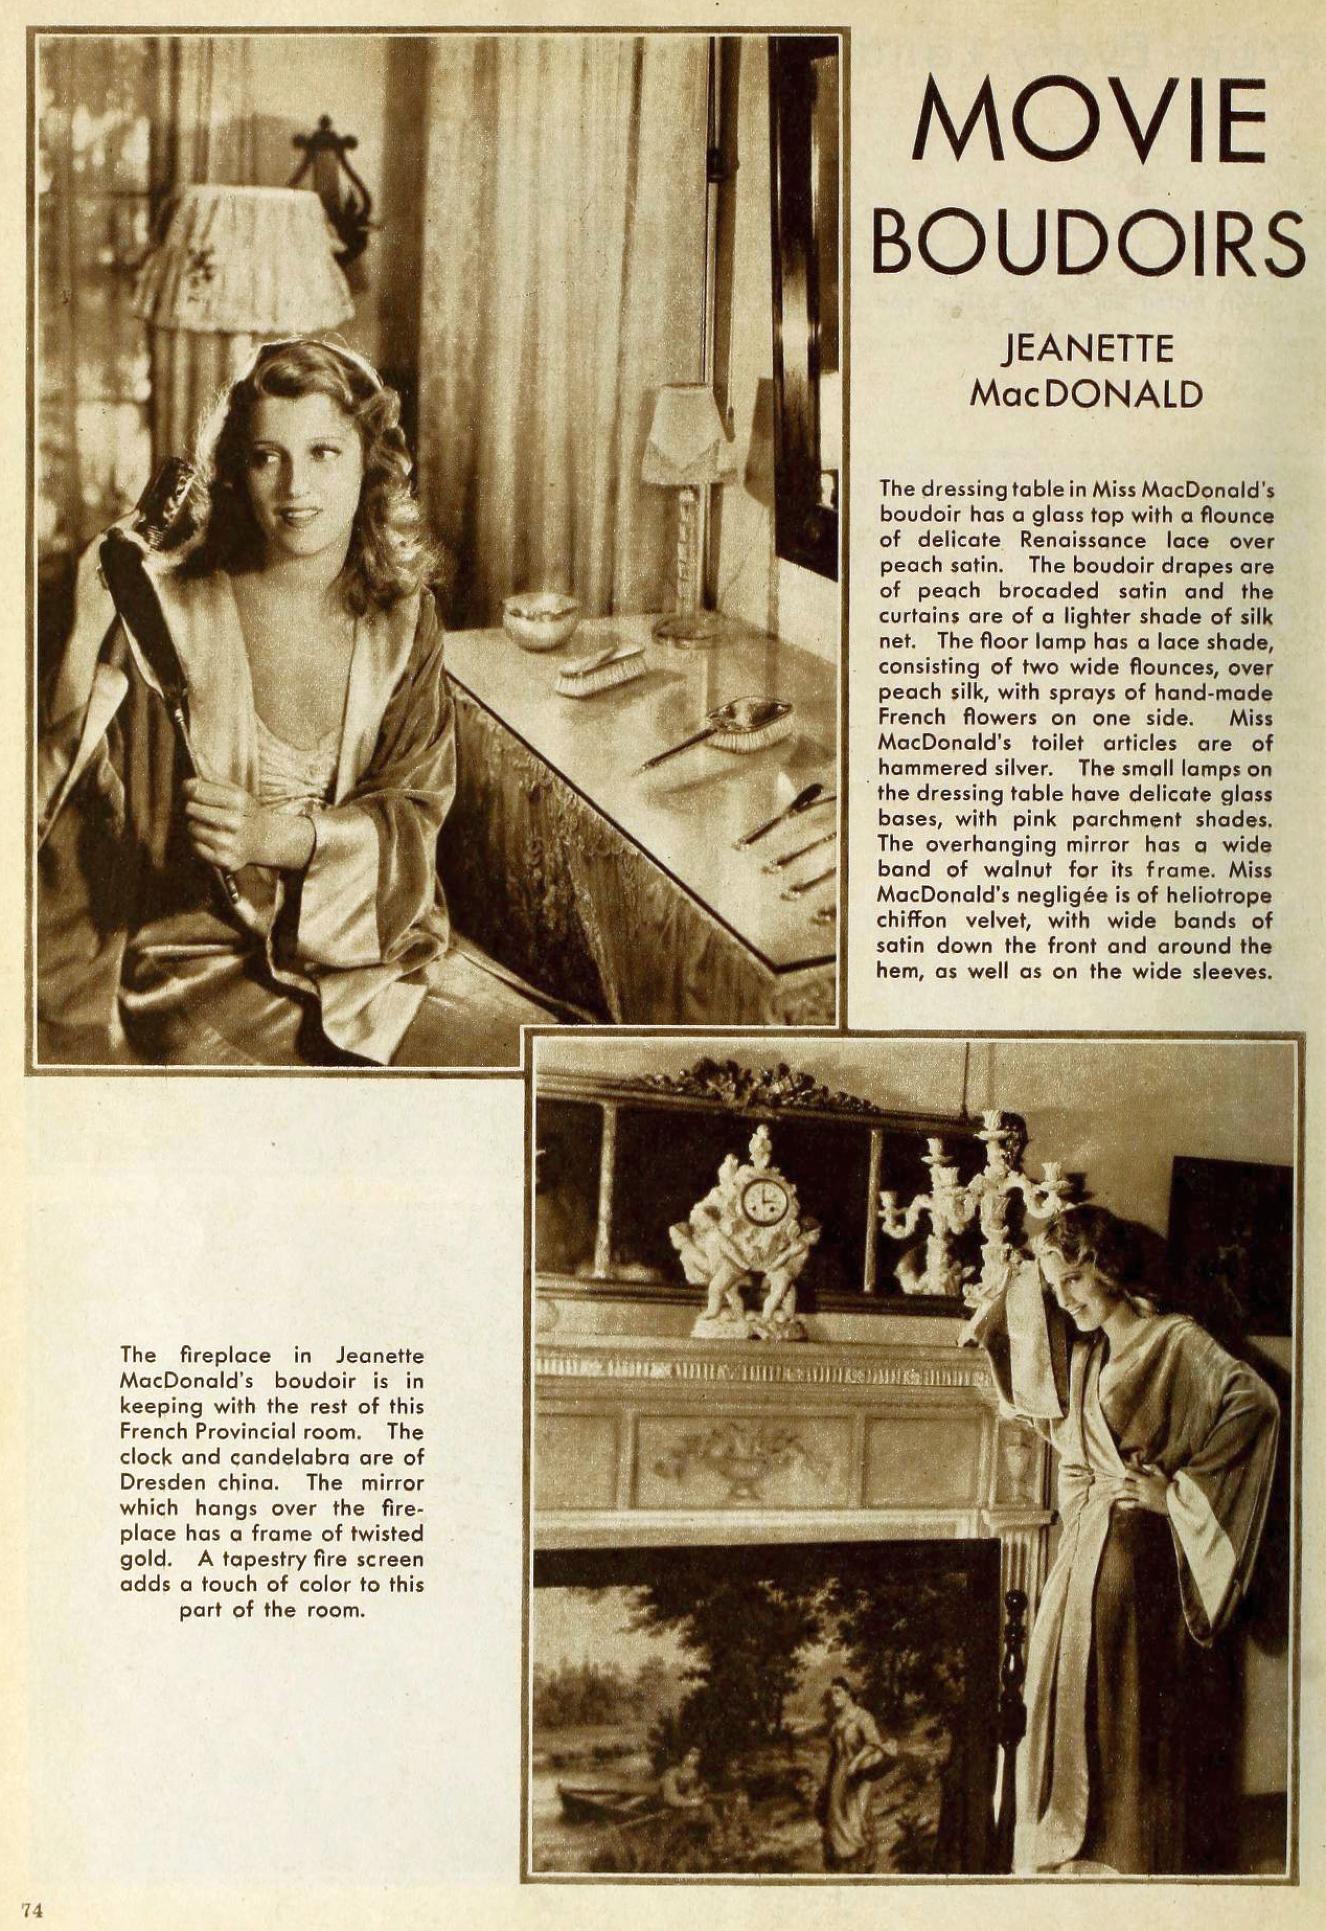 jeanette macdonald the new movie magazine january 1931aa